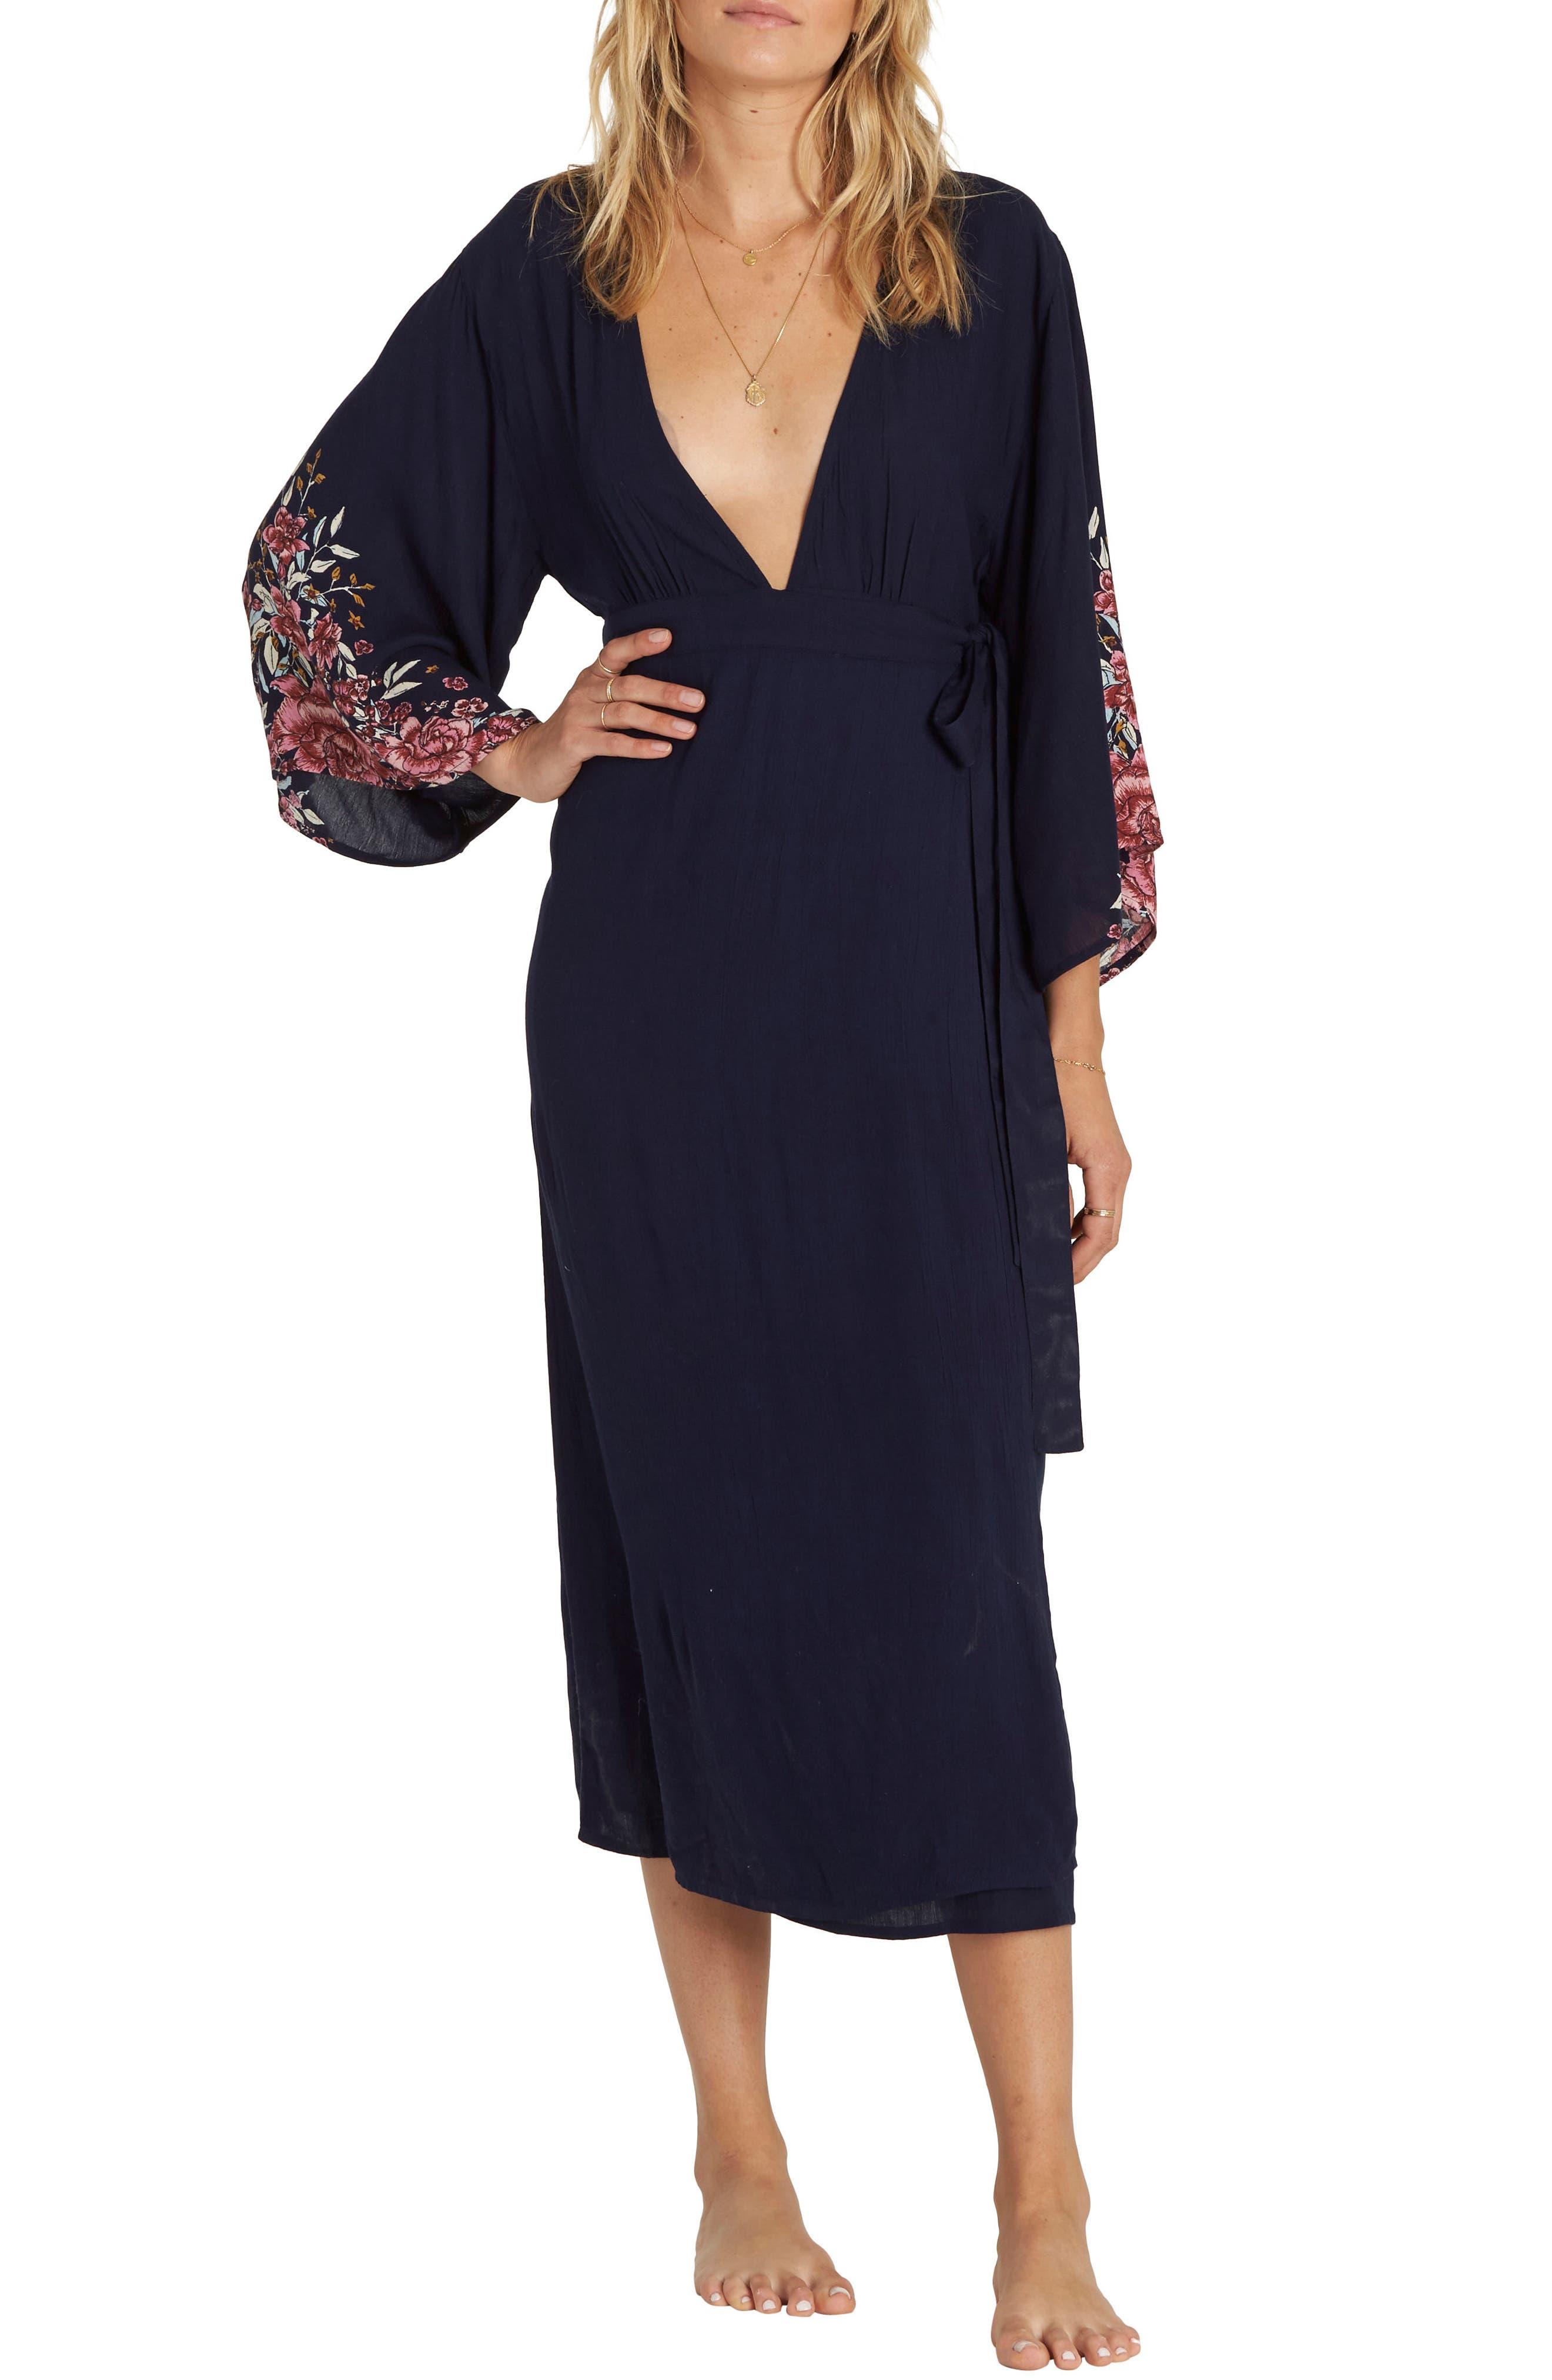 Robe Life Midi Dress,                             Main thumbnail 1, color,